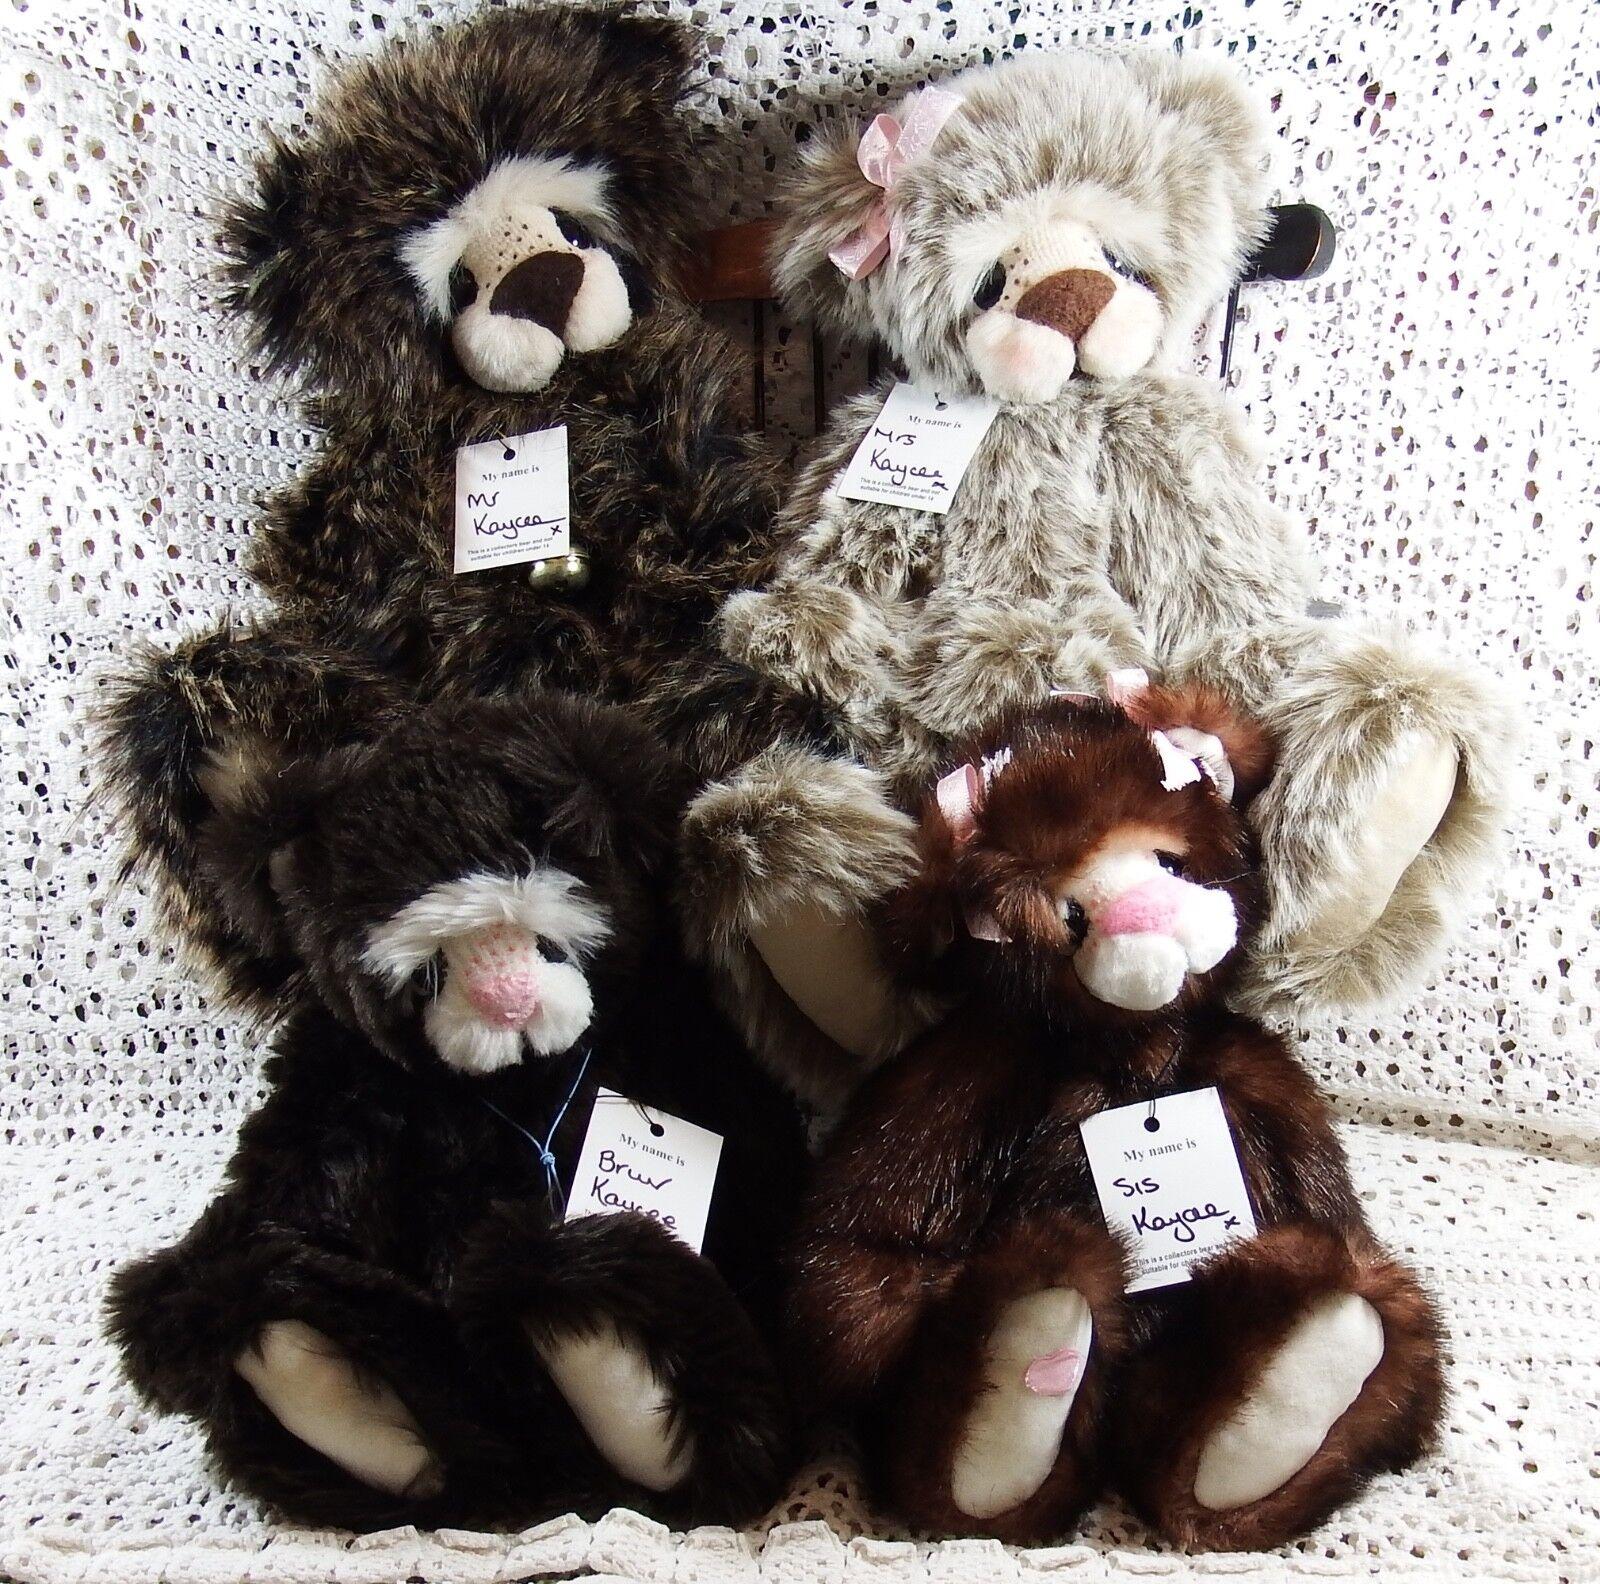 Rare 1st Edtn Kaycee Bears Family Mrs Kaycee Mr Kaycee Bruv Kaycee & Sis Kaycee